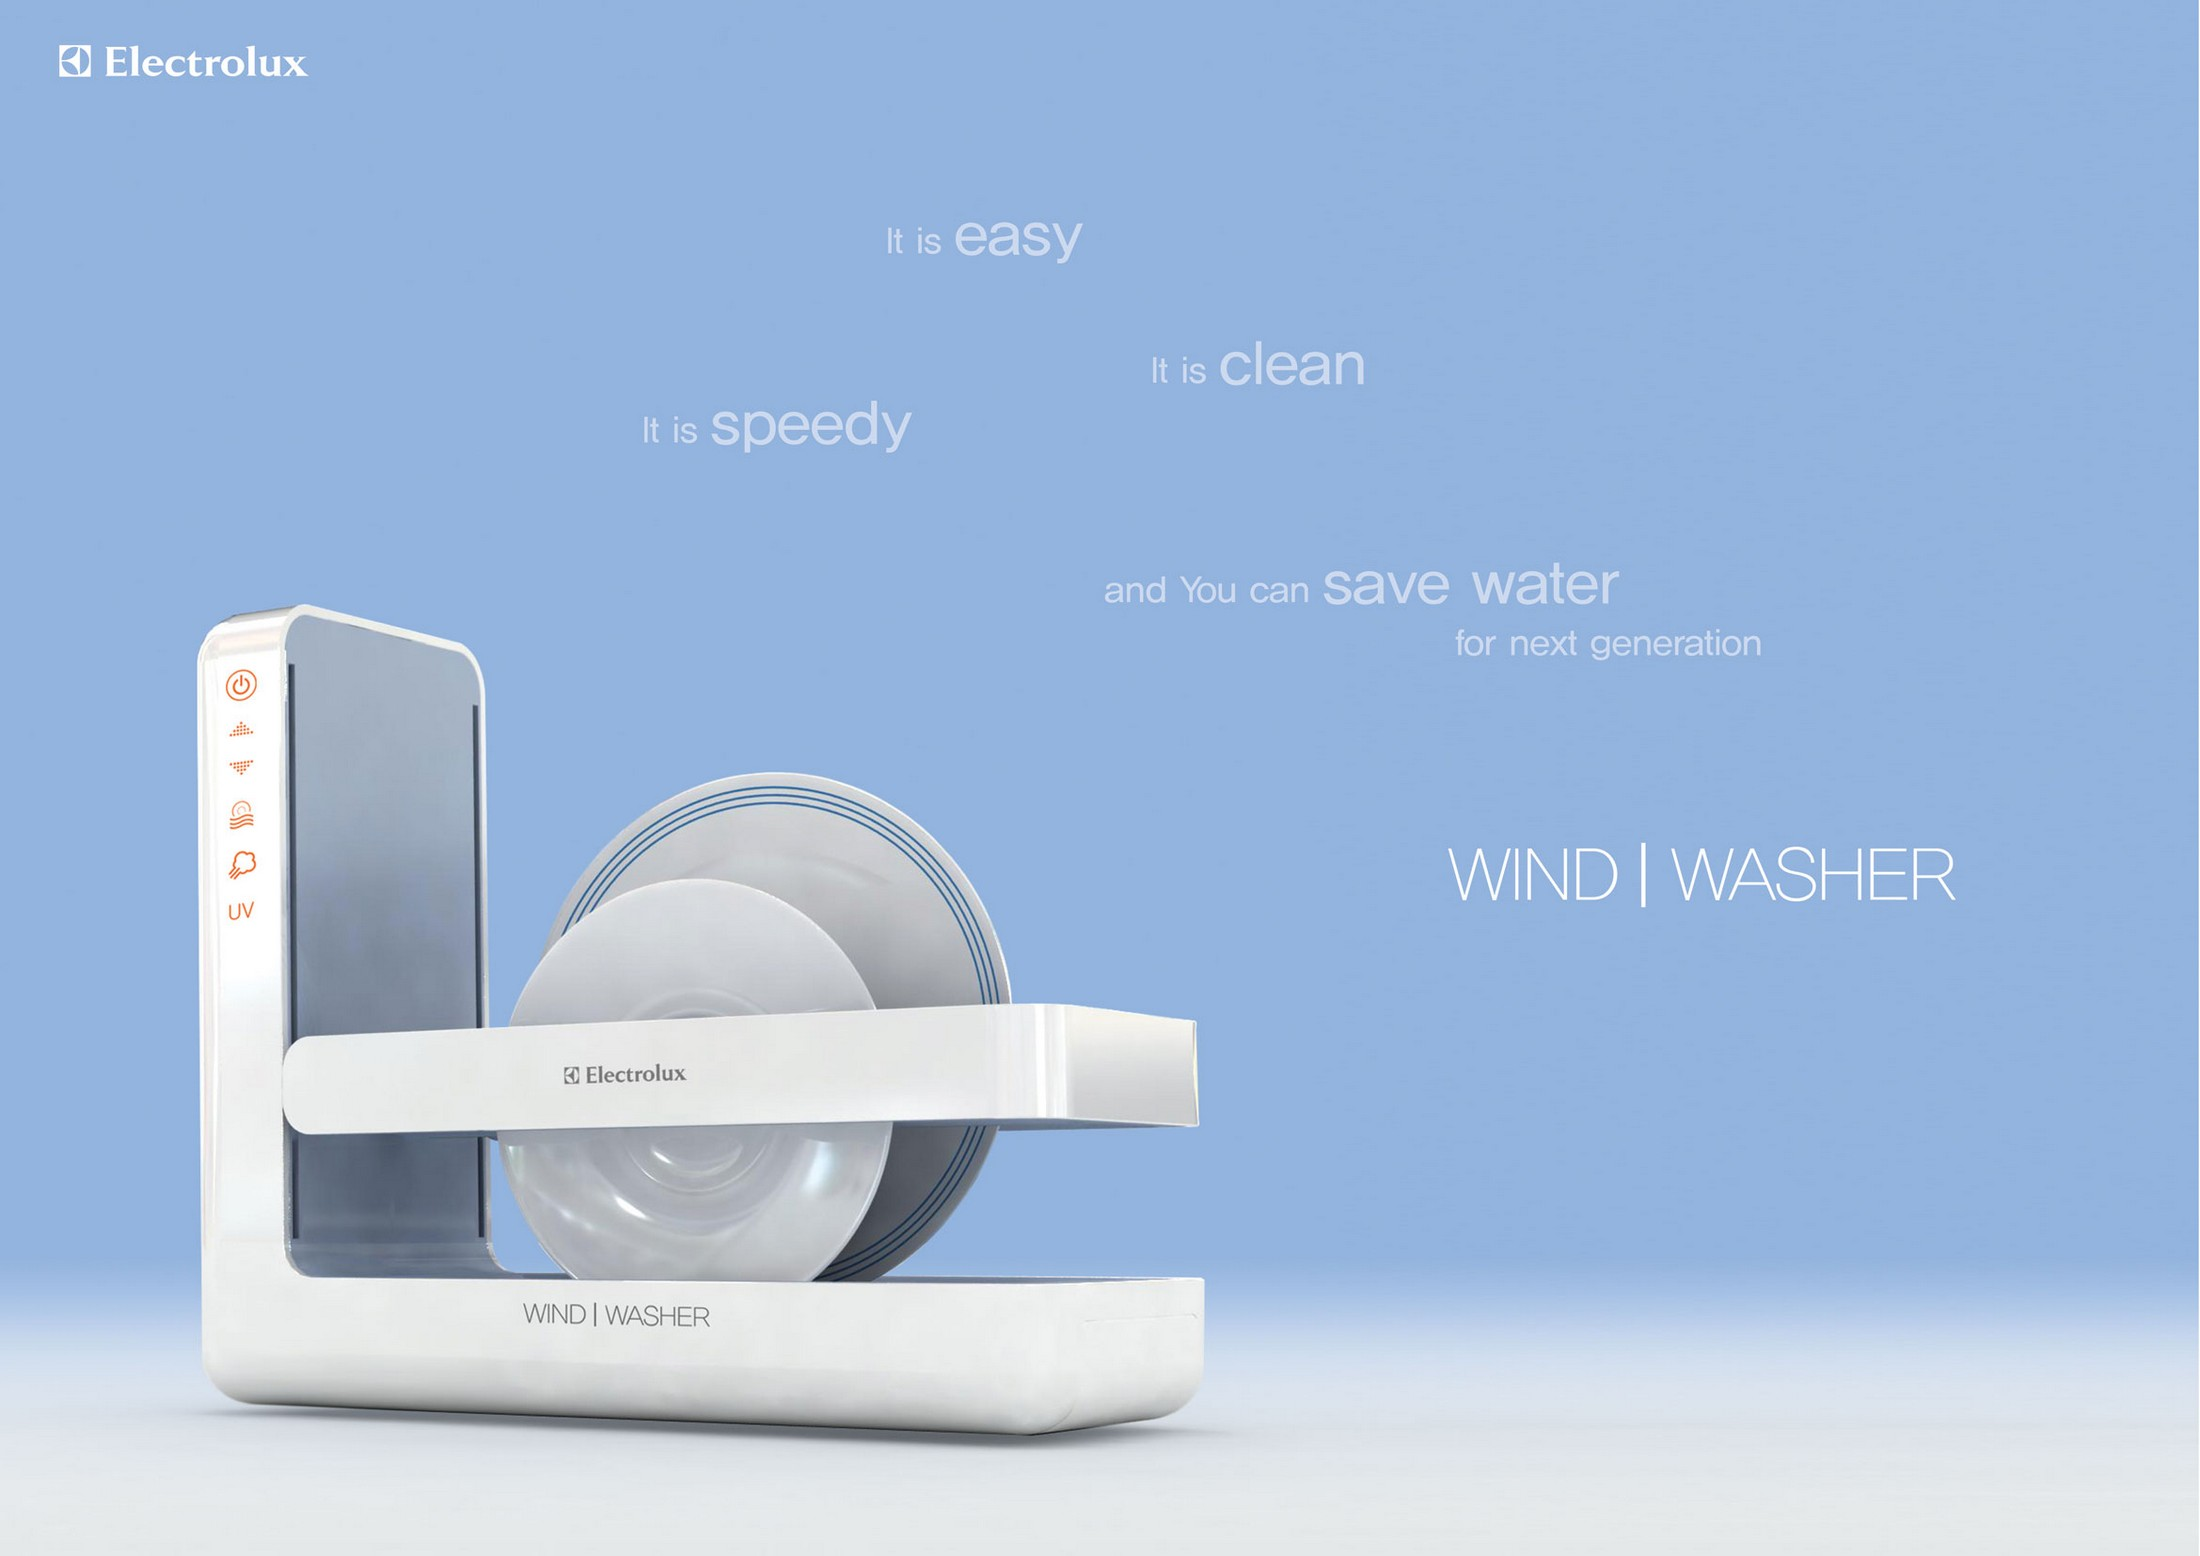 Electrolux Wind Washer